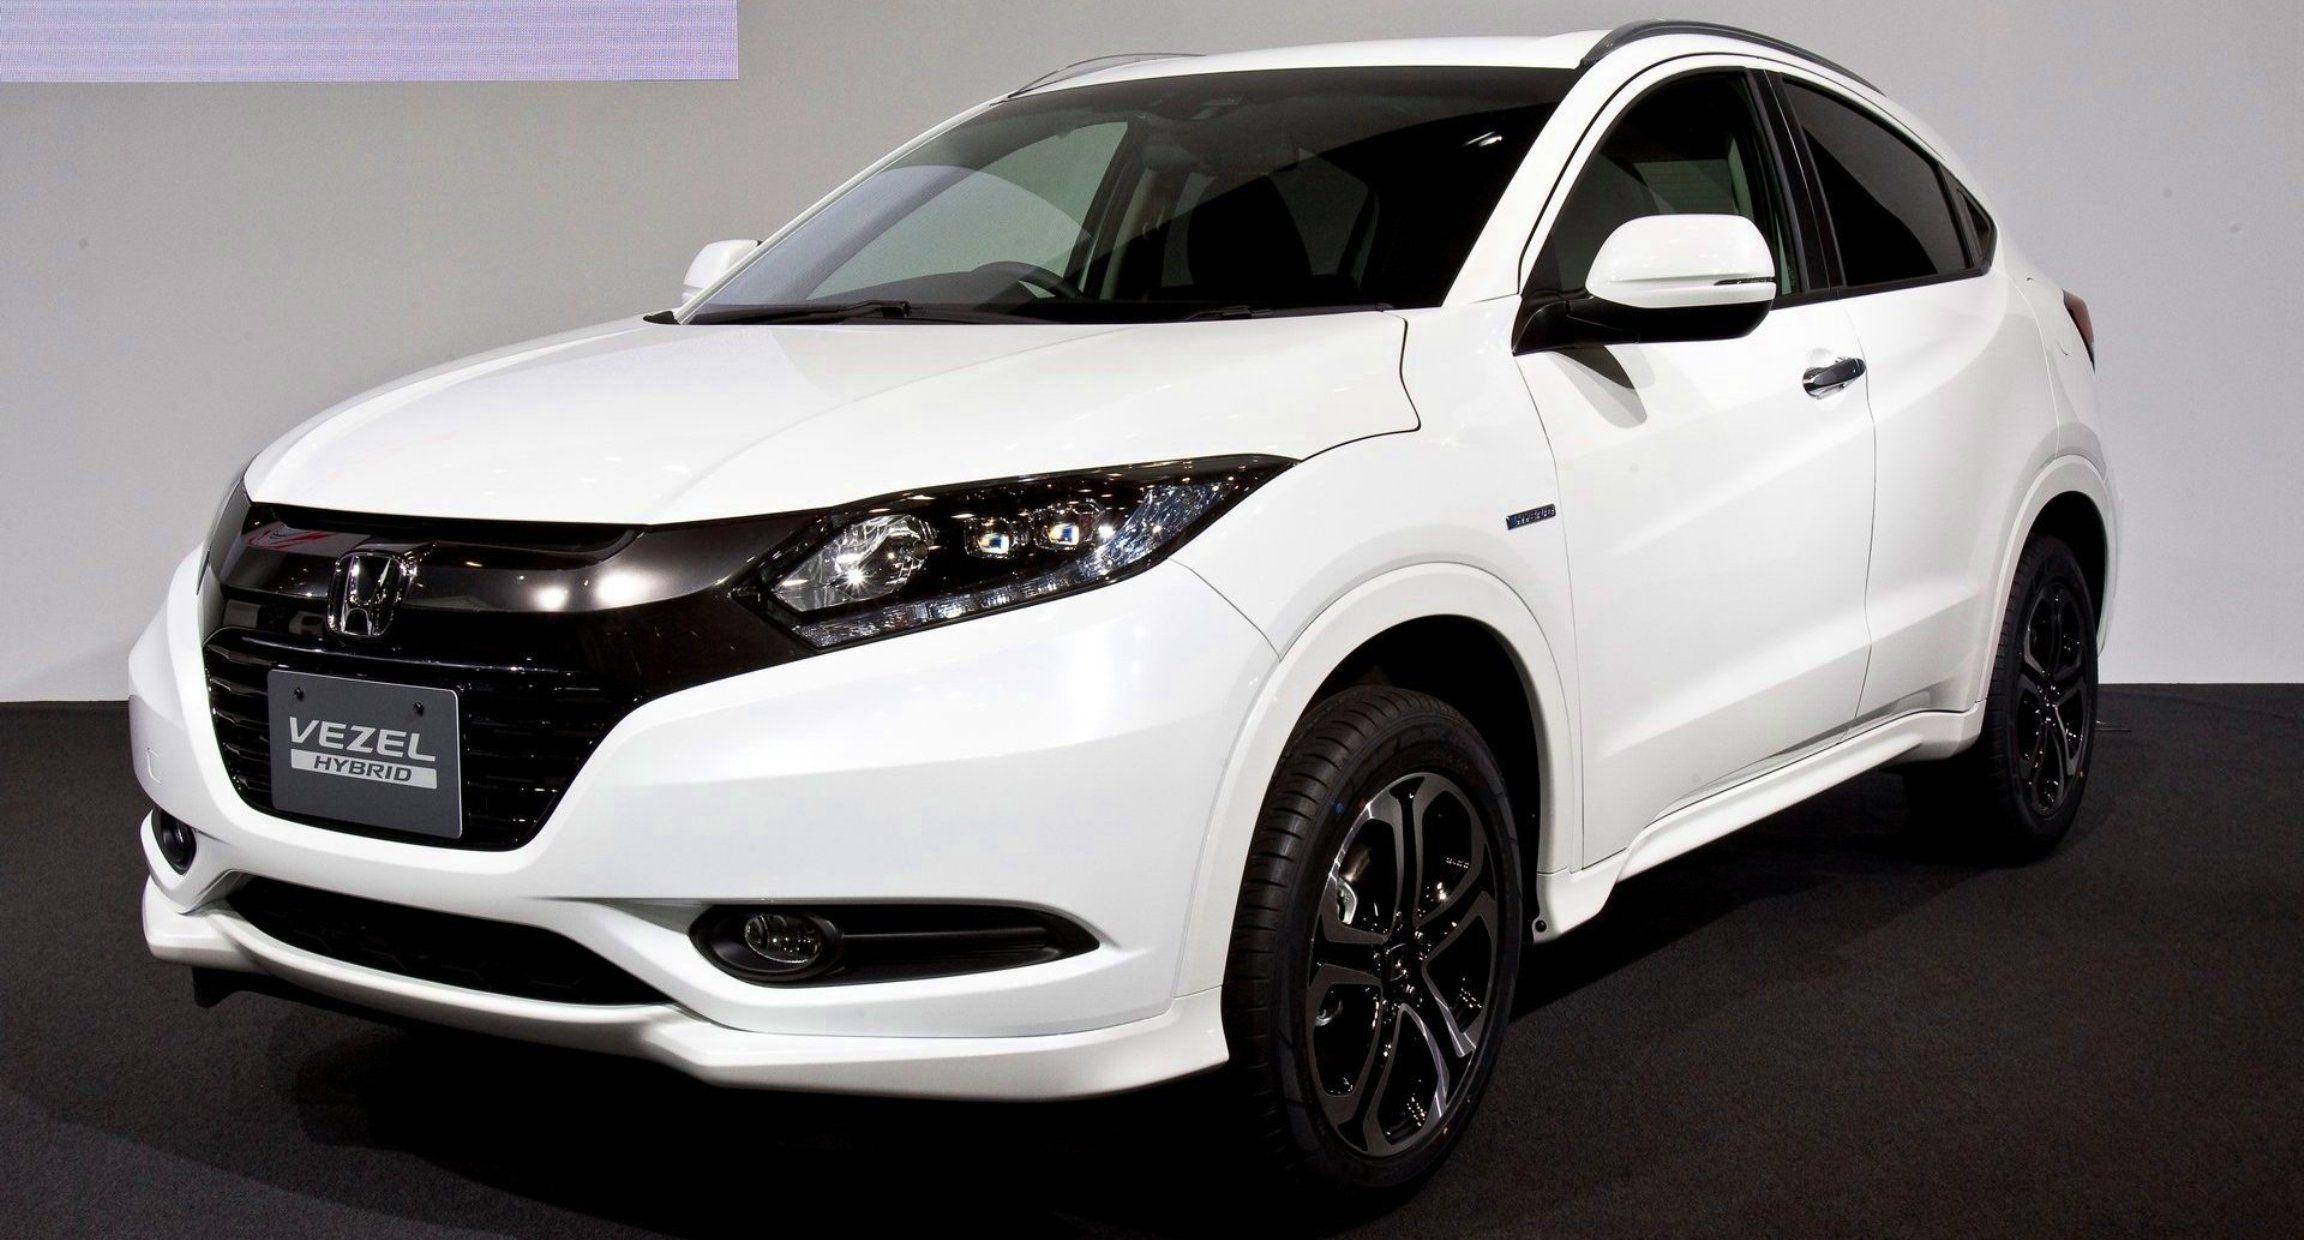 Honda vezel hybrid previews possible 2015 civic cuv 2014 civic honda and honda hrv